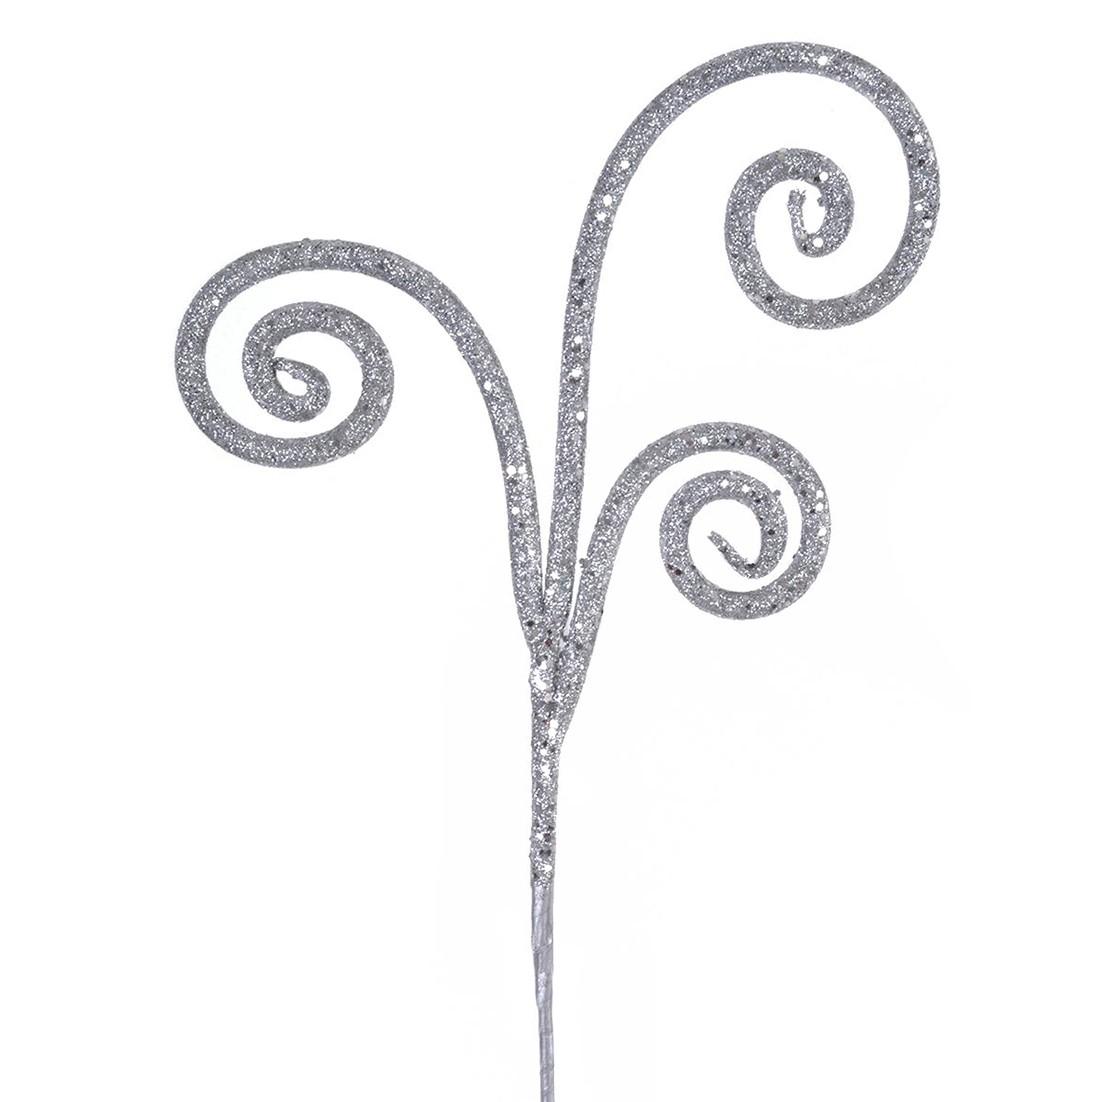 Haste Natalina 44 cm Twigs Prata - 30630-151